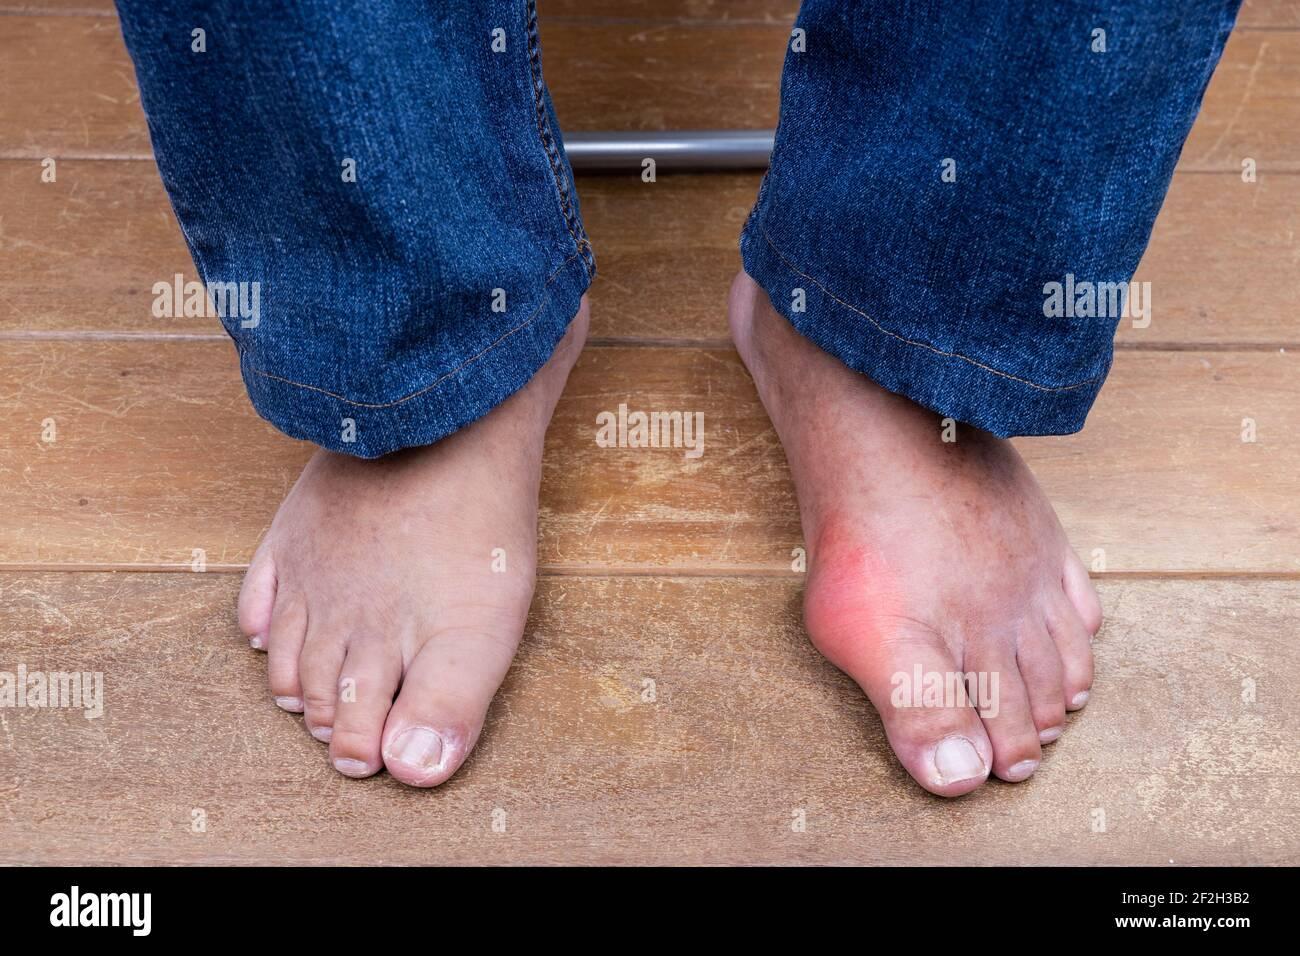 Fuß geschwollen gicht Geschwollene Füße: